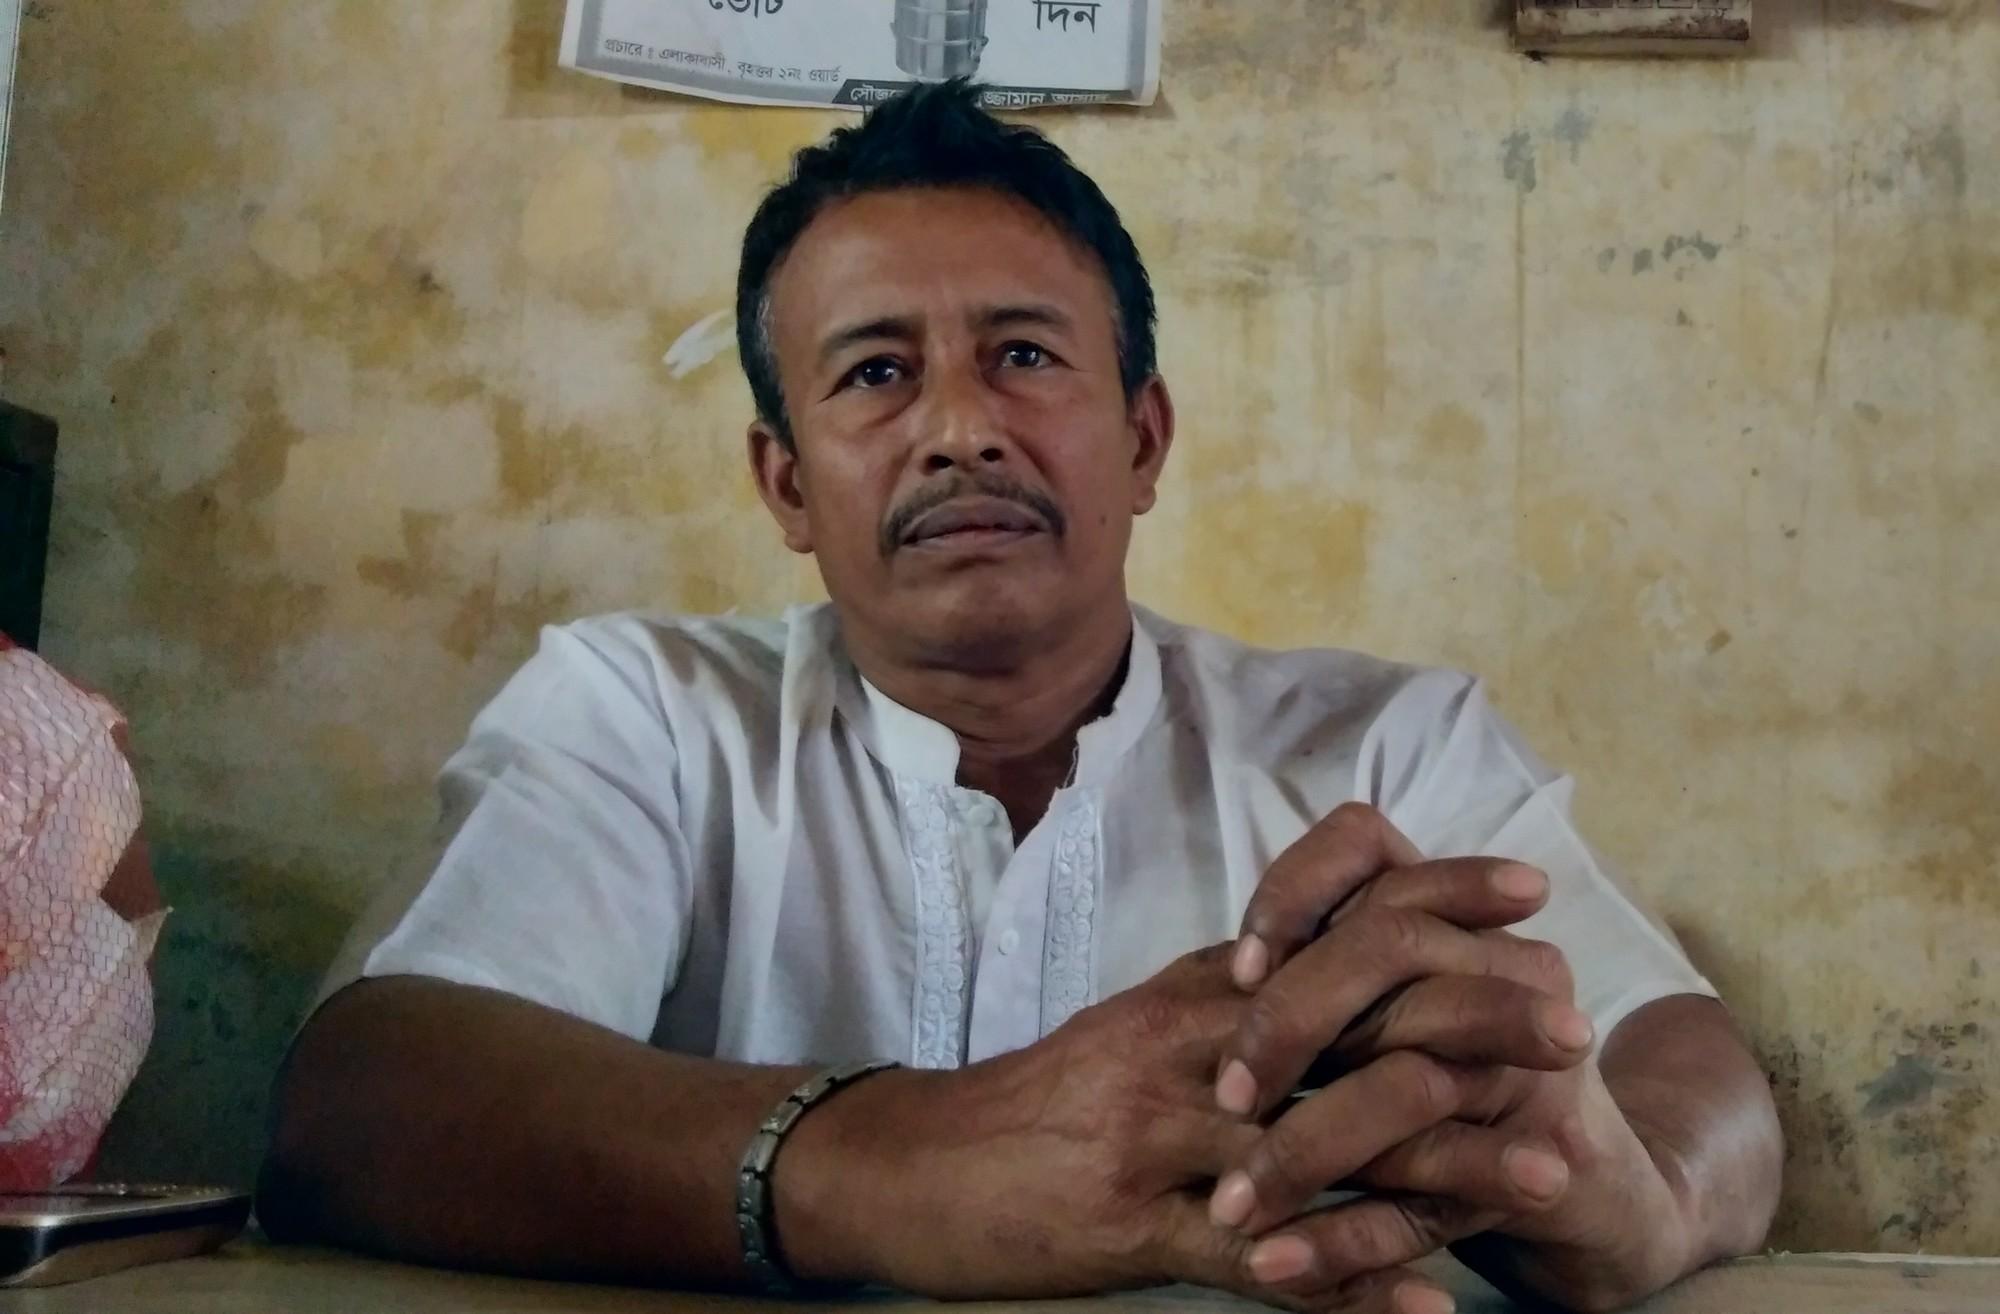 Community leader in Dhaka